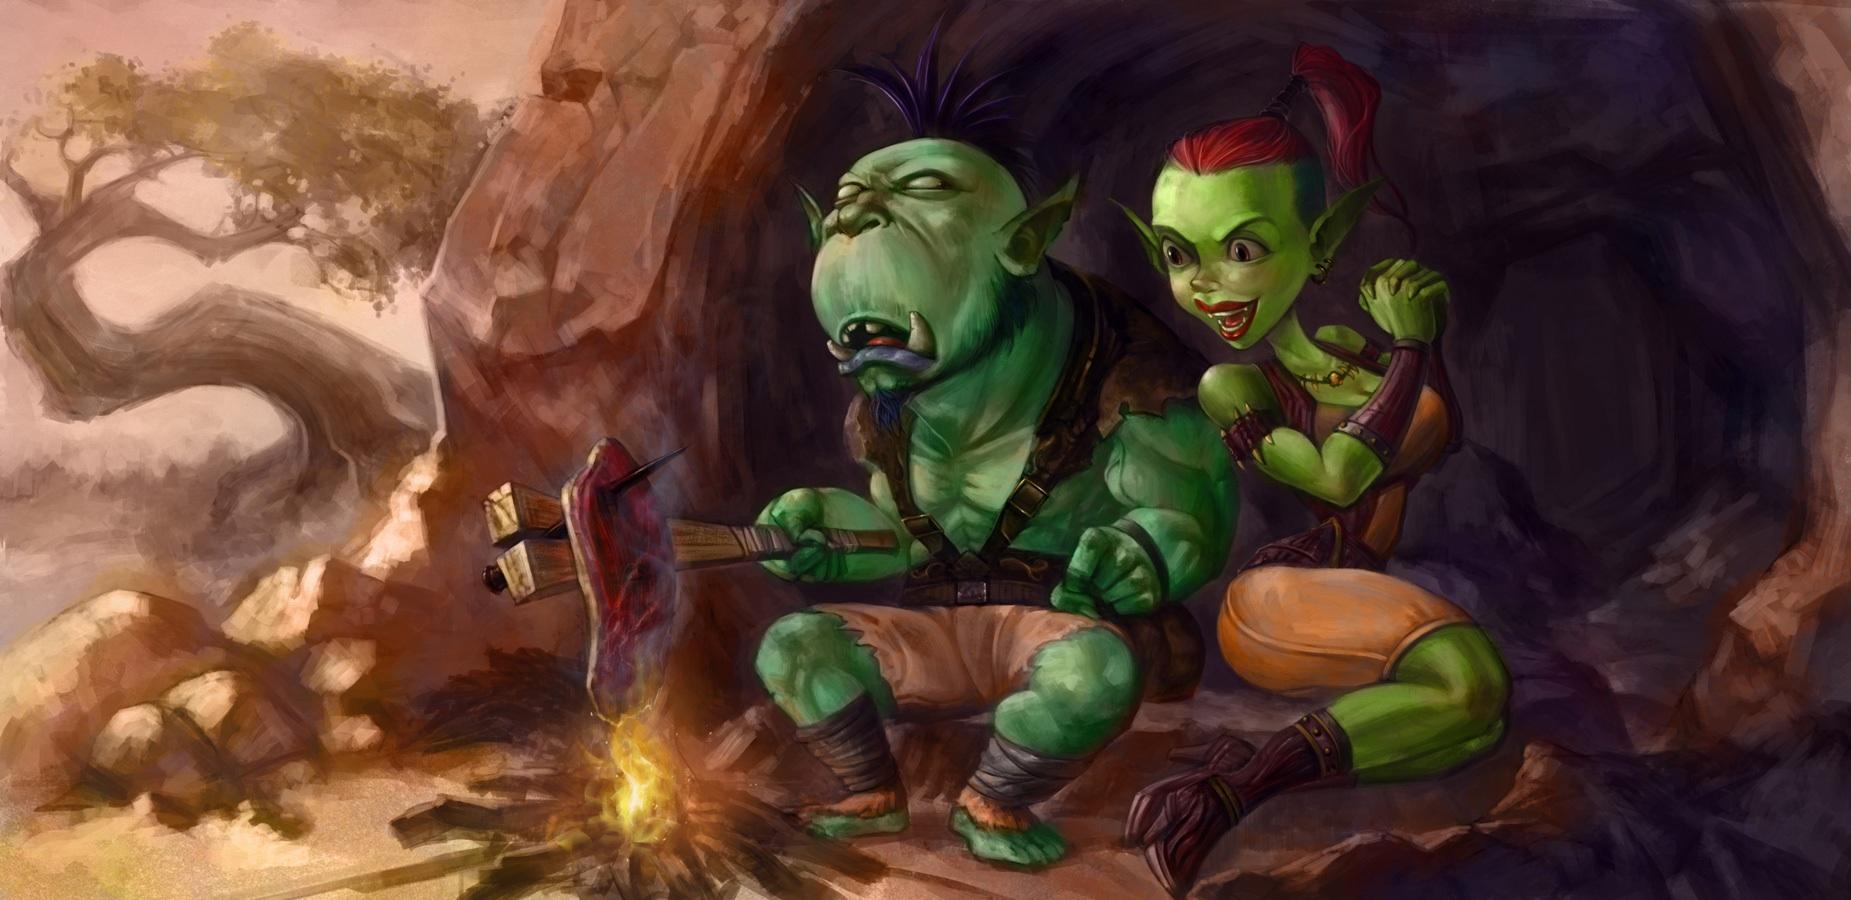 Female goblin cartoon picture